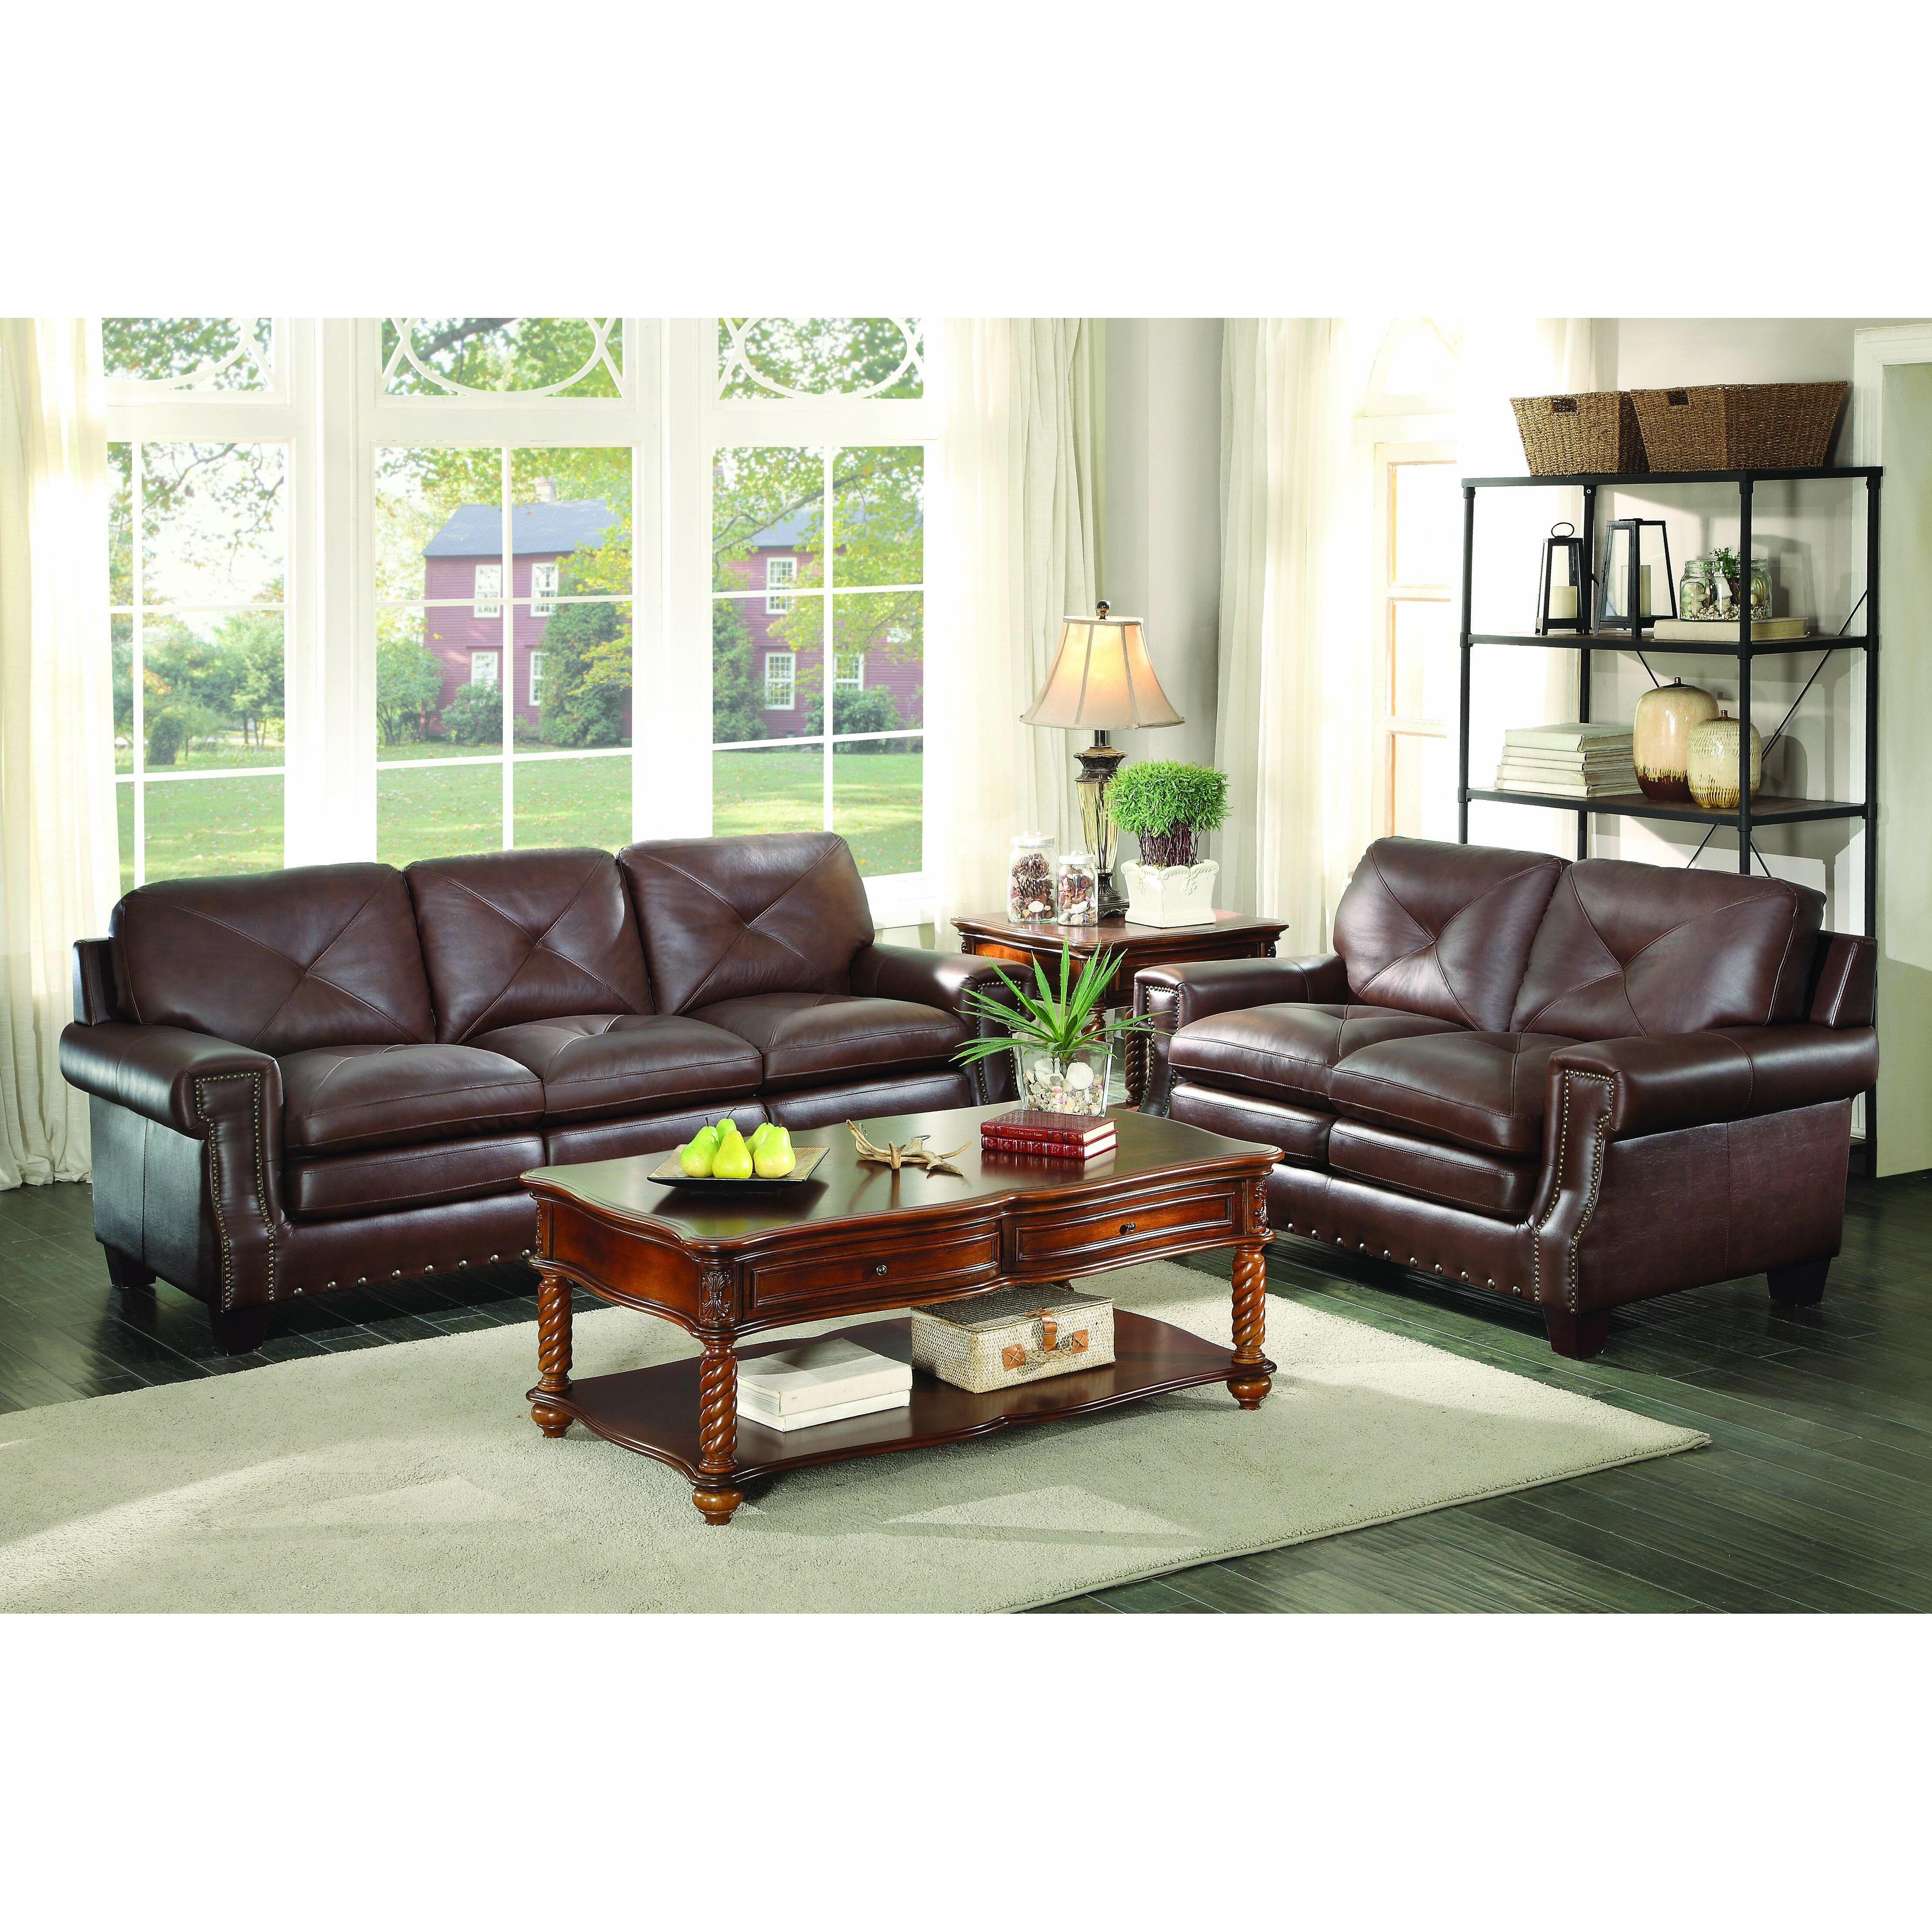 Homelegance Greermont Living Room Collection Wayfair